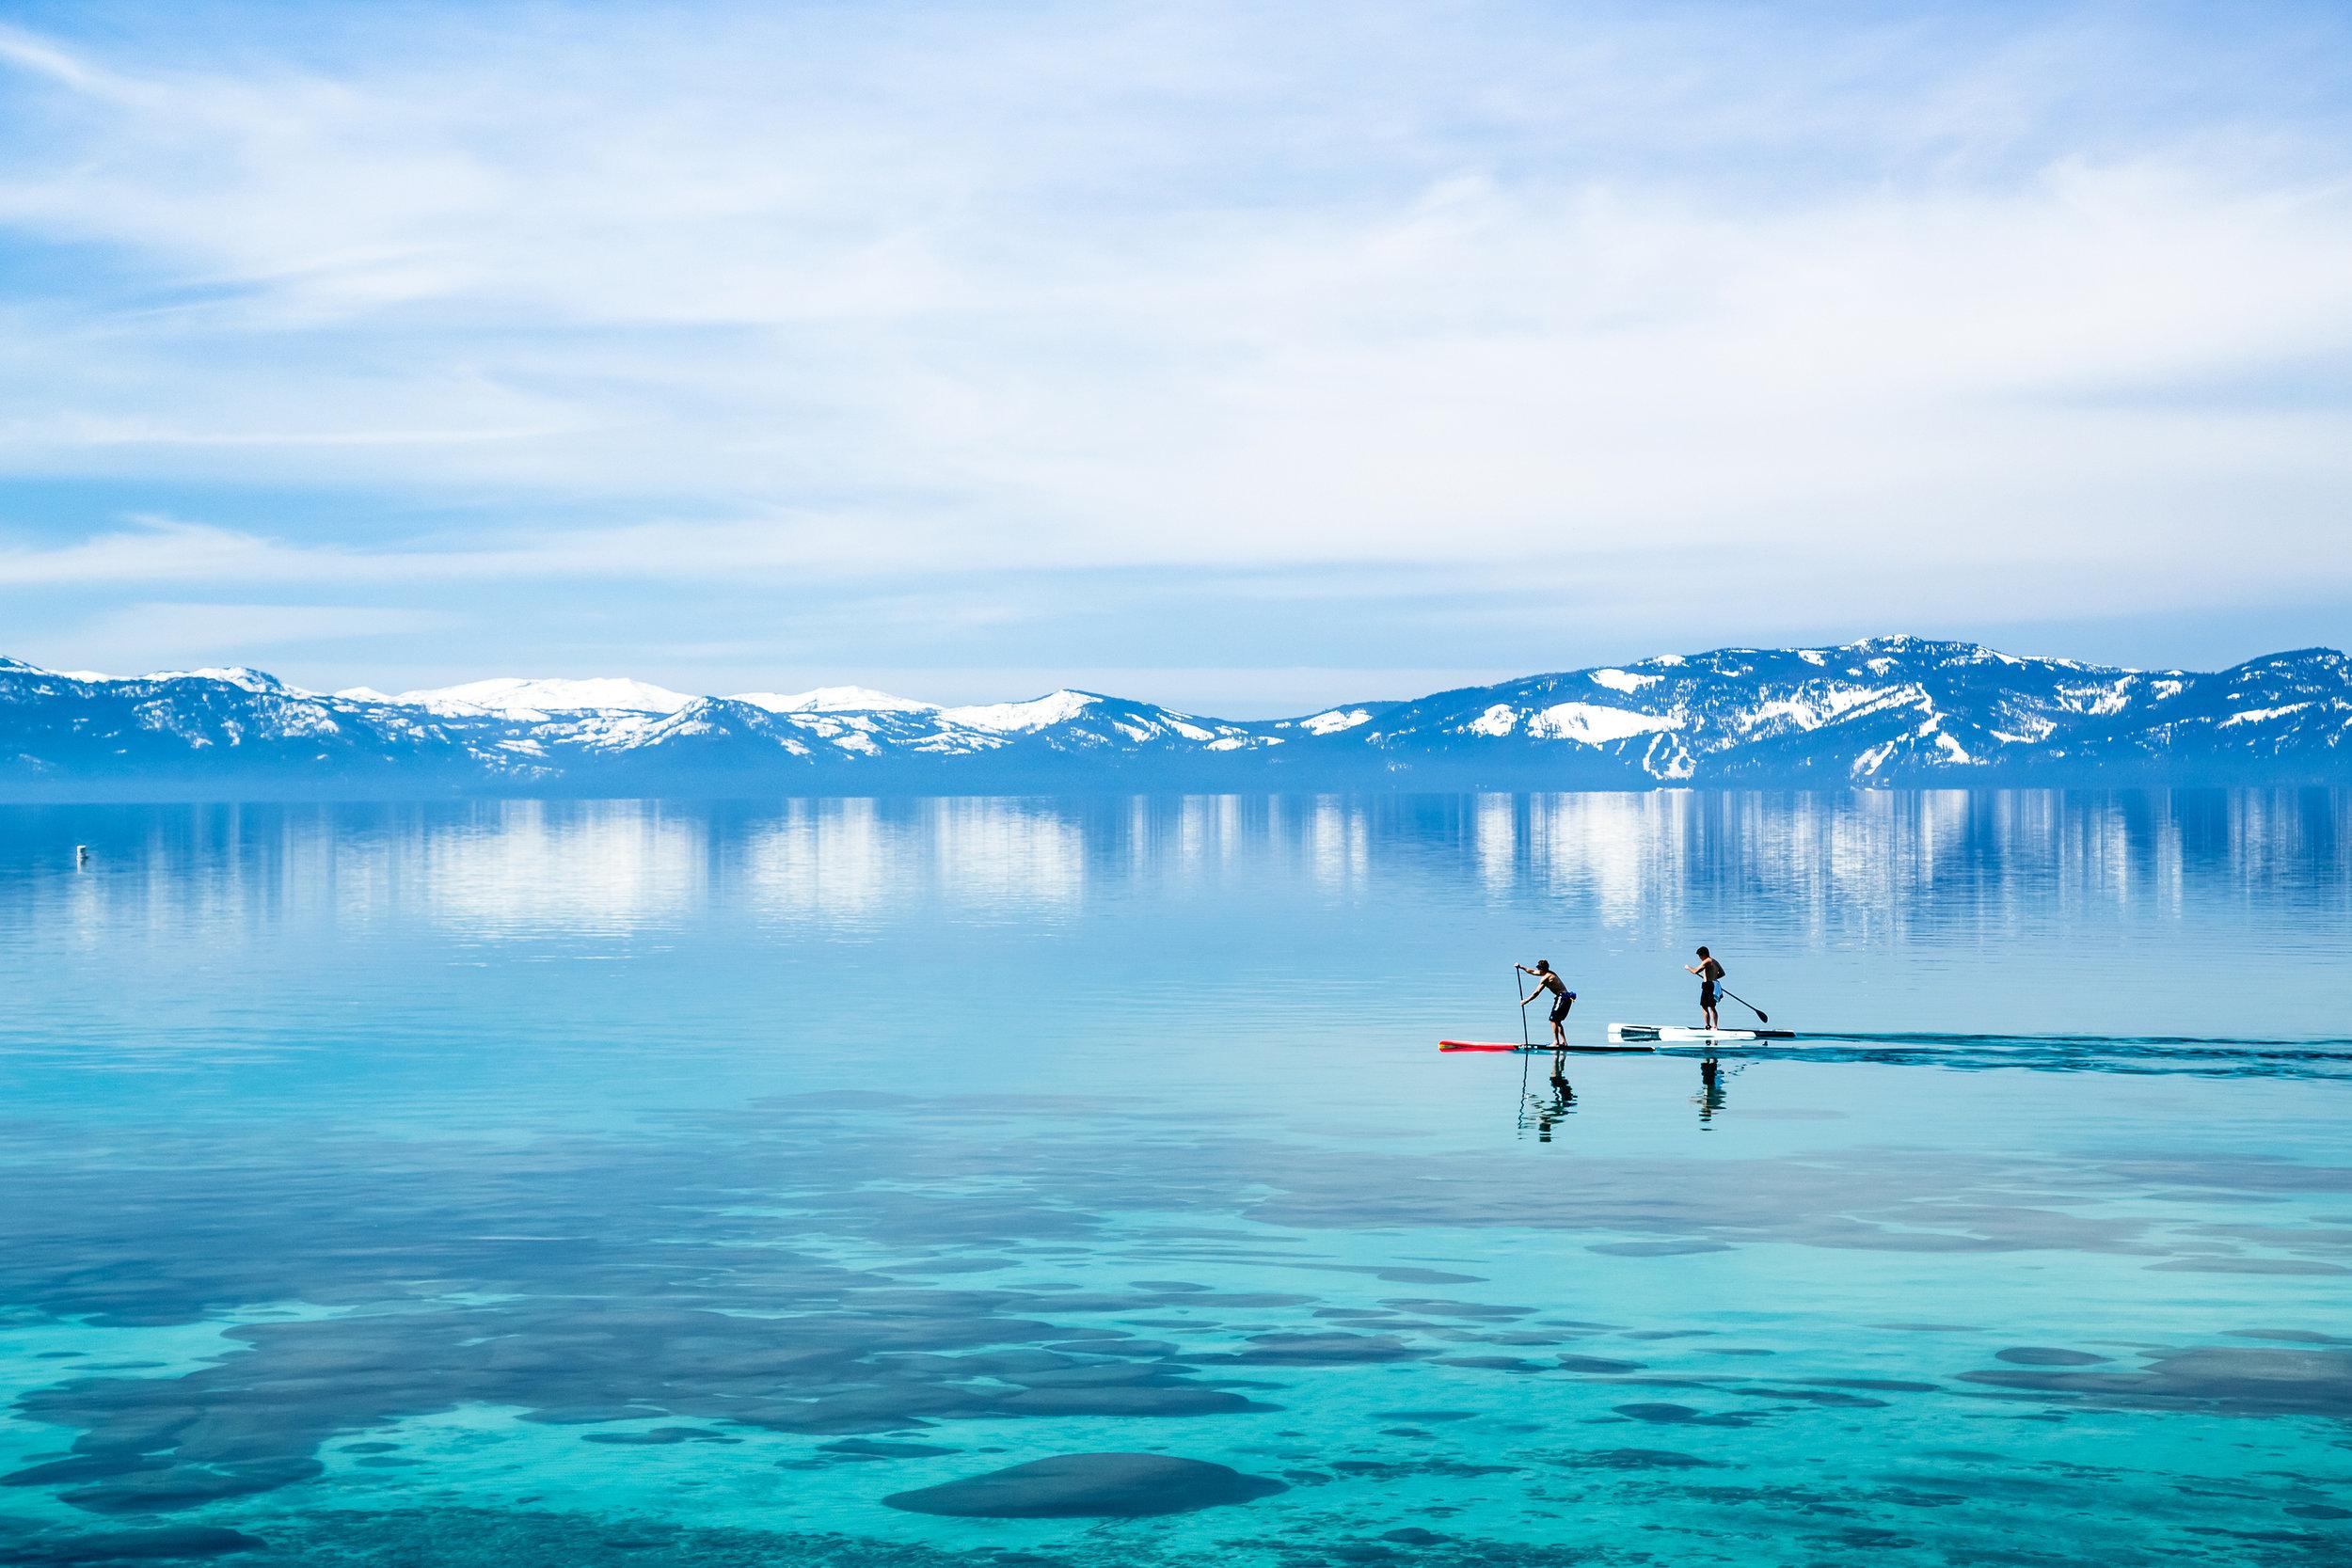 bigstock-Paddle-boarding-64564342.jpg